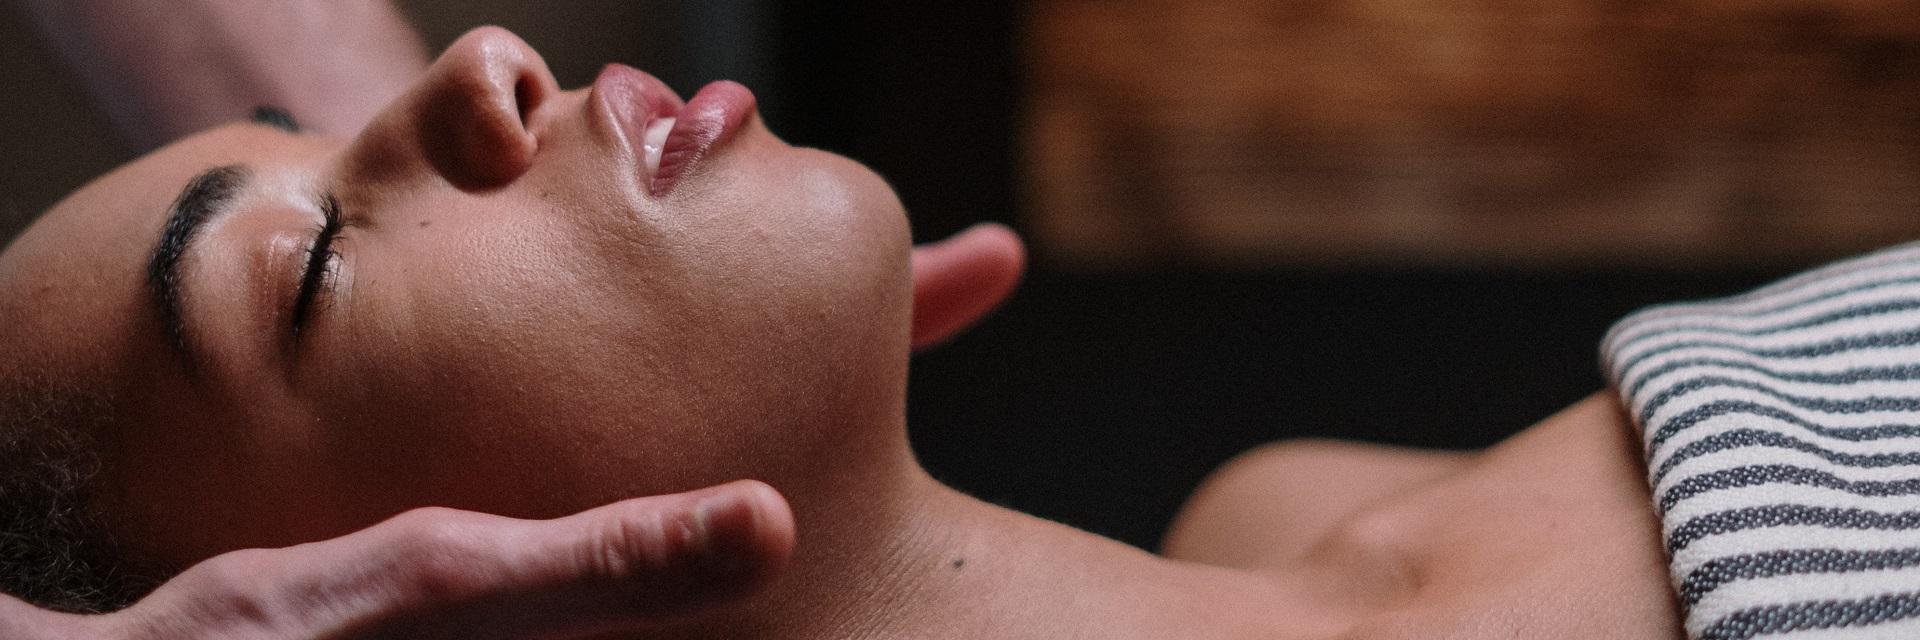 Biološki tretmani lica i Šampanj Lux tretman